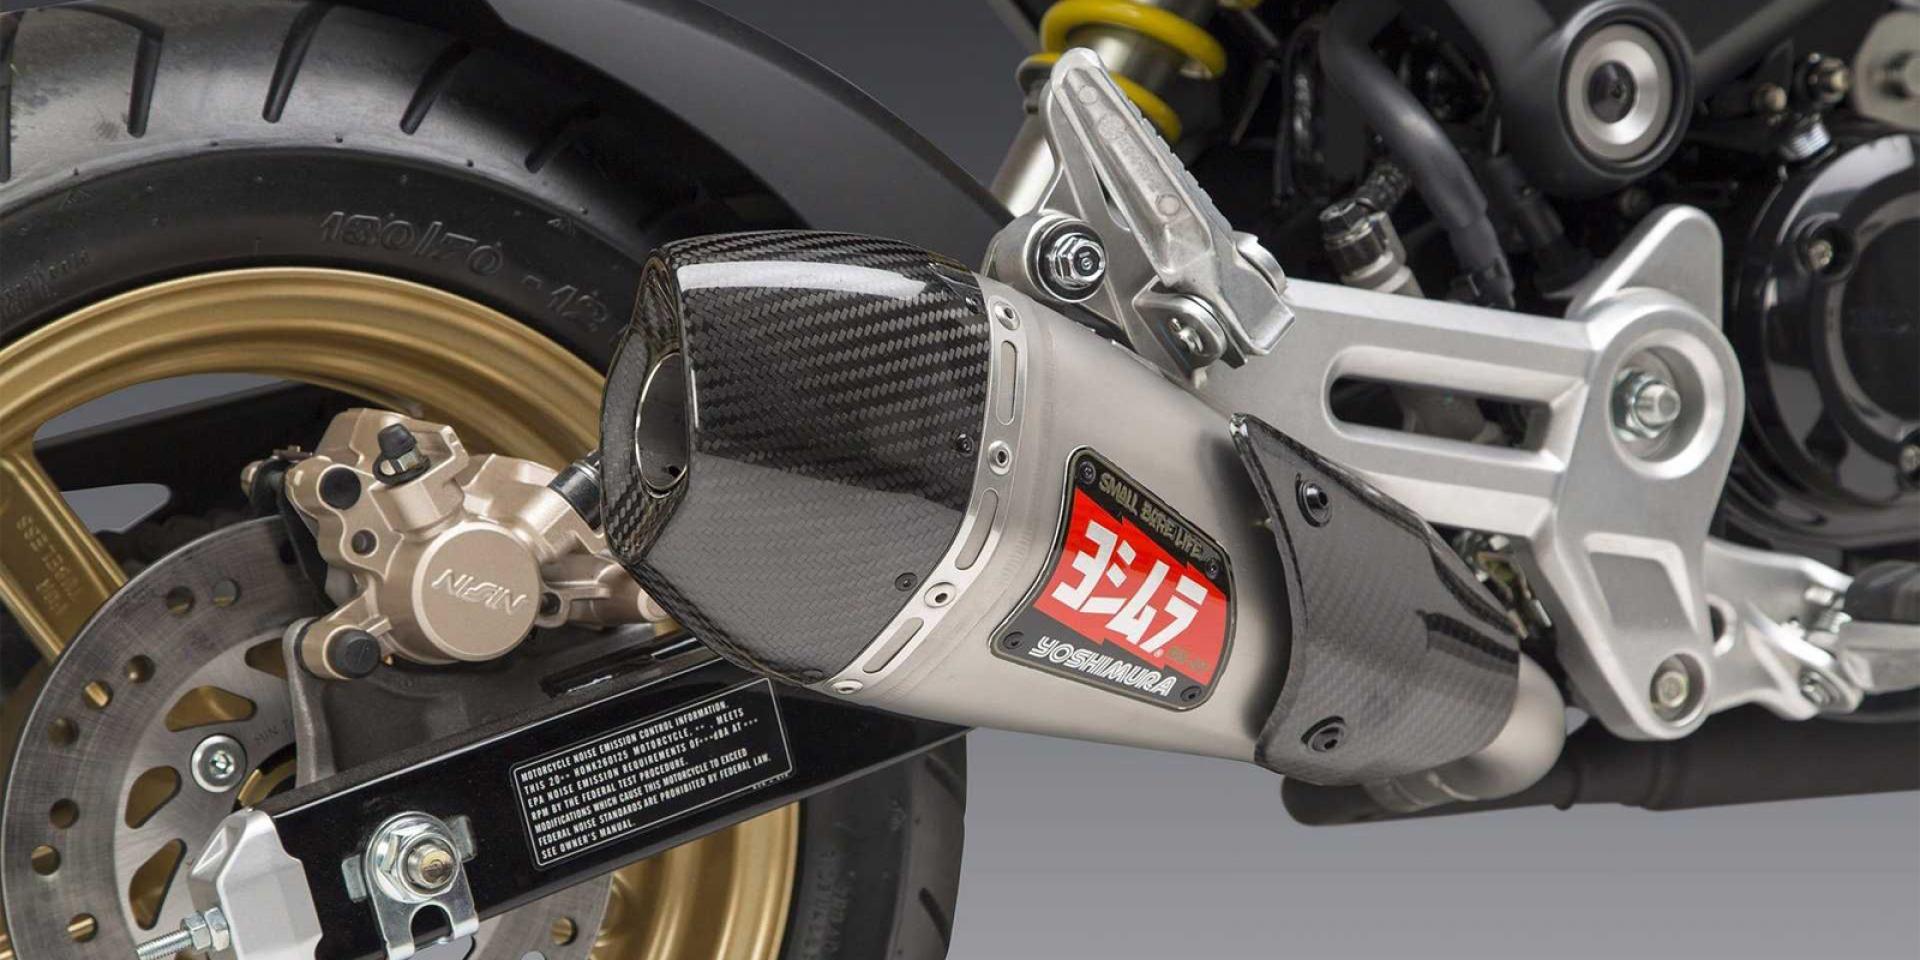 馬力提升11%!Yoshimura RS-9T MSX125專用排氣管